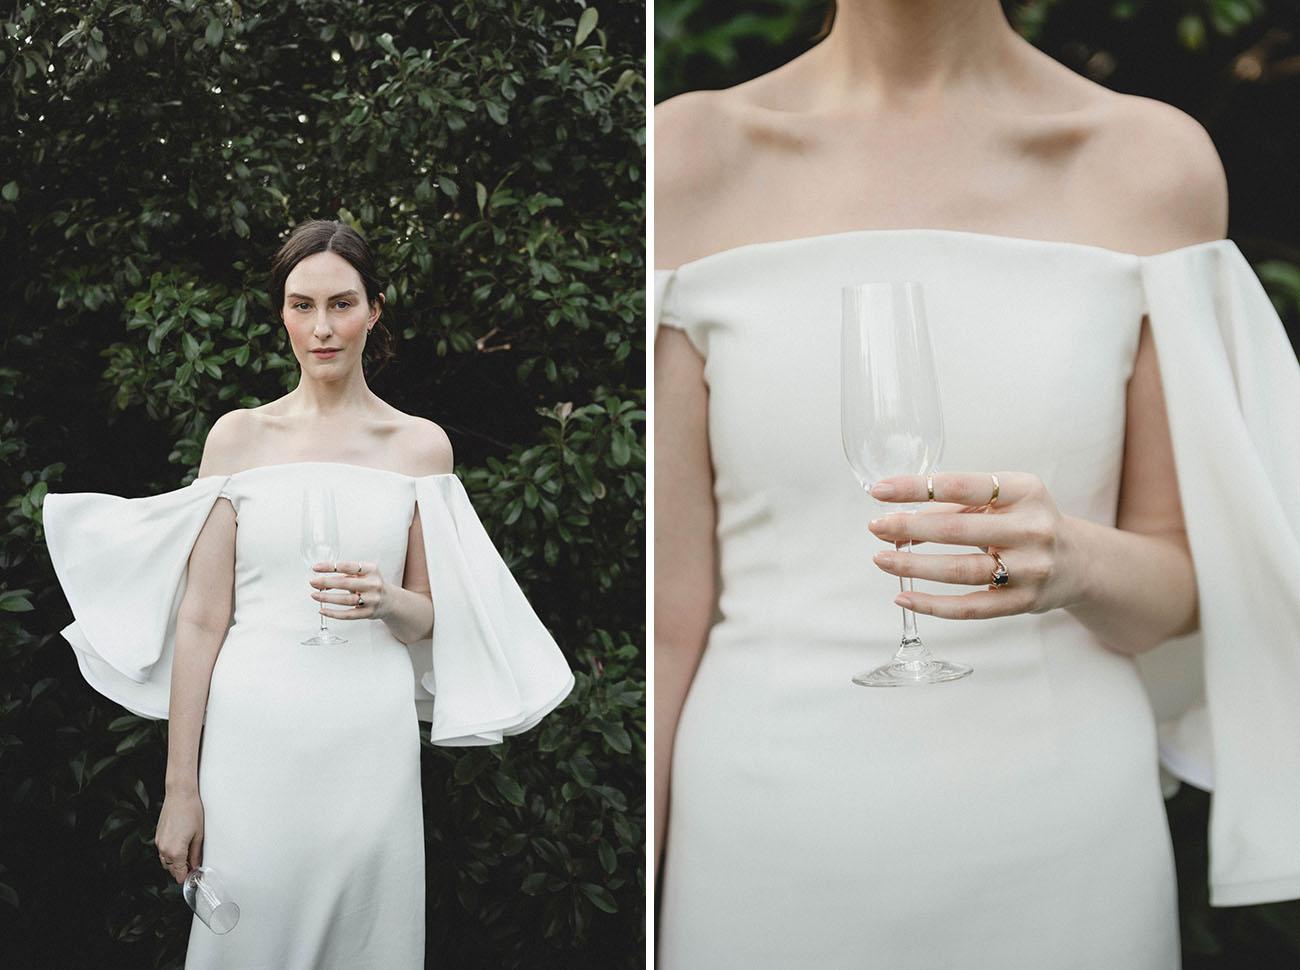 Vows Wedding Dresses 79 Elegant Minimalist Modern Vow Renewal